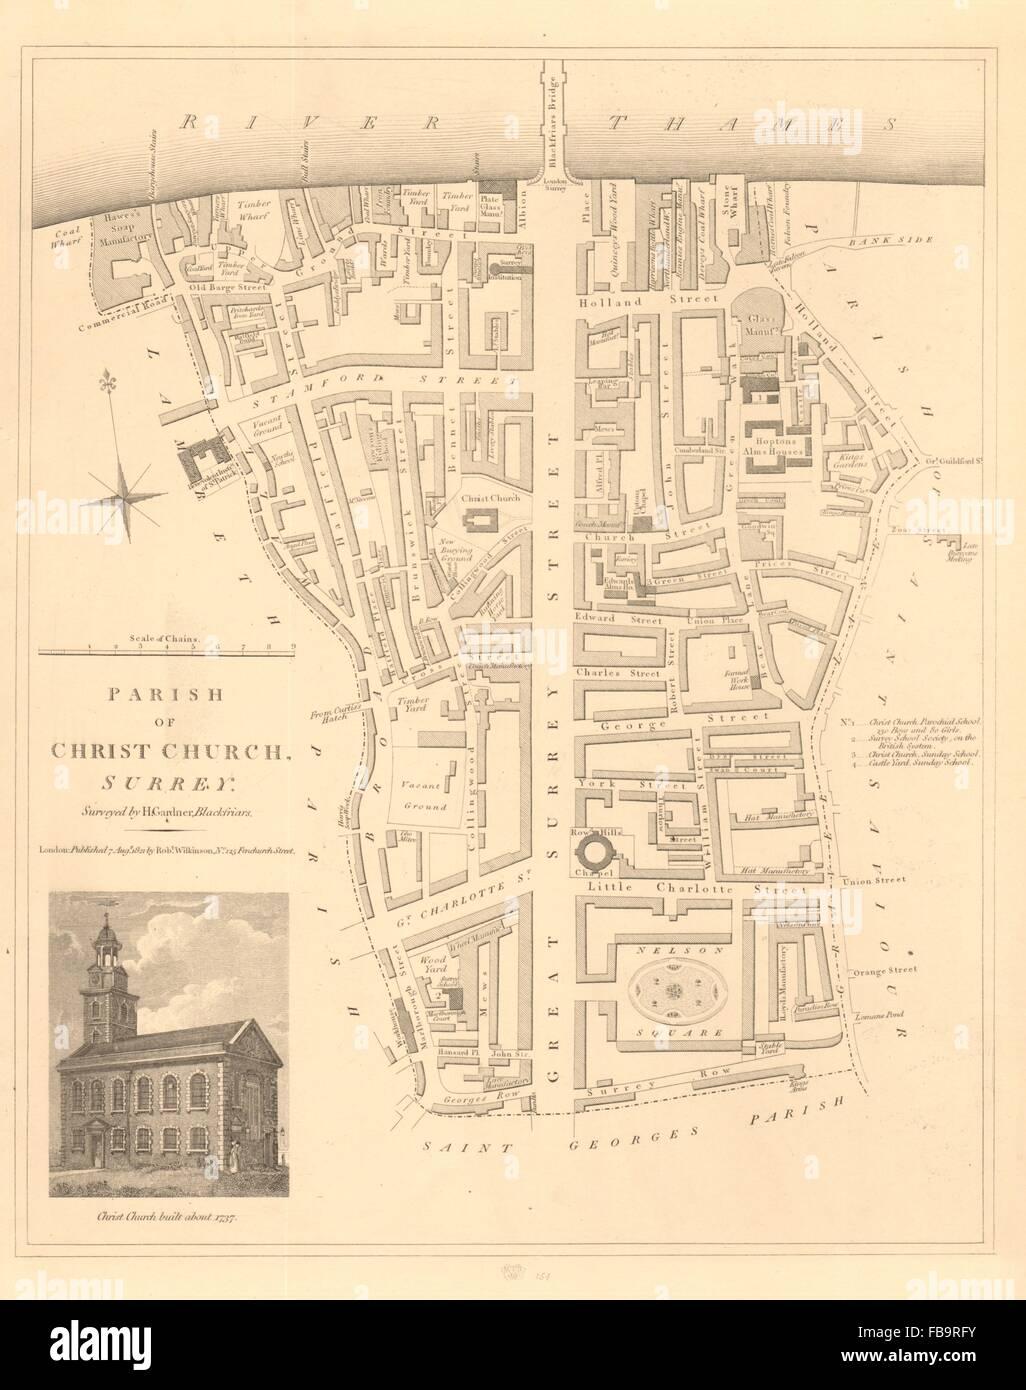 christ church parish southwark south bankbankside london 1834 antique map